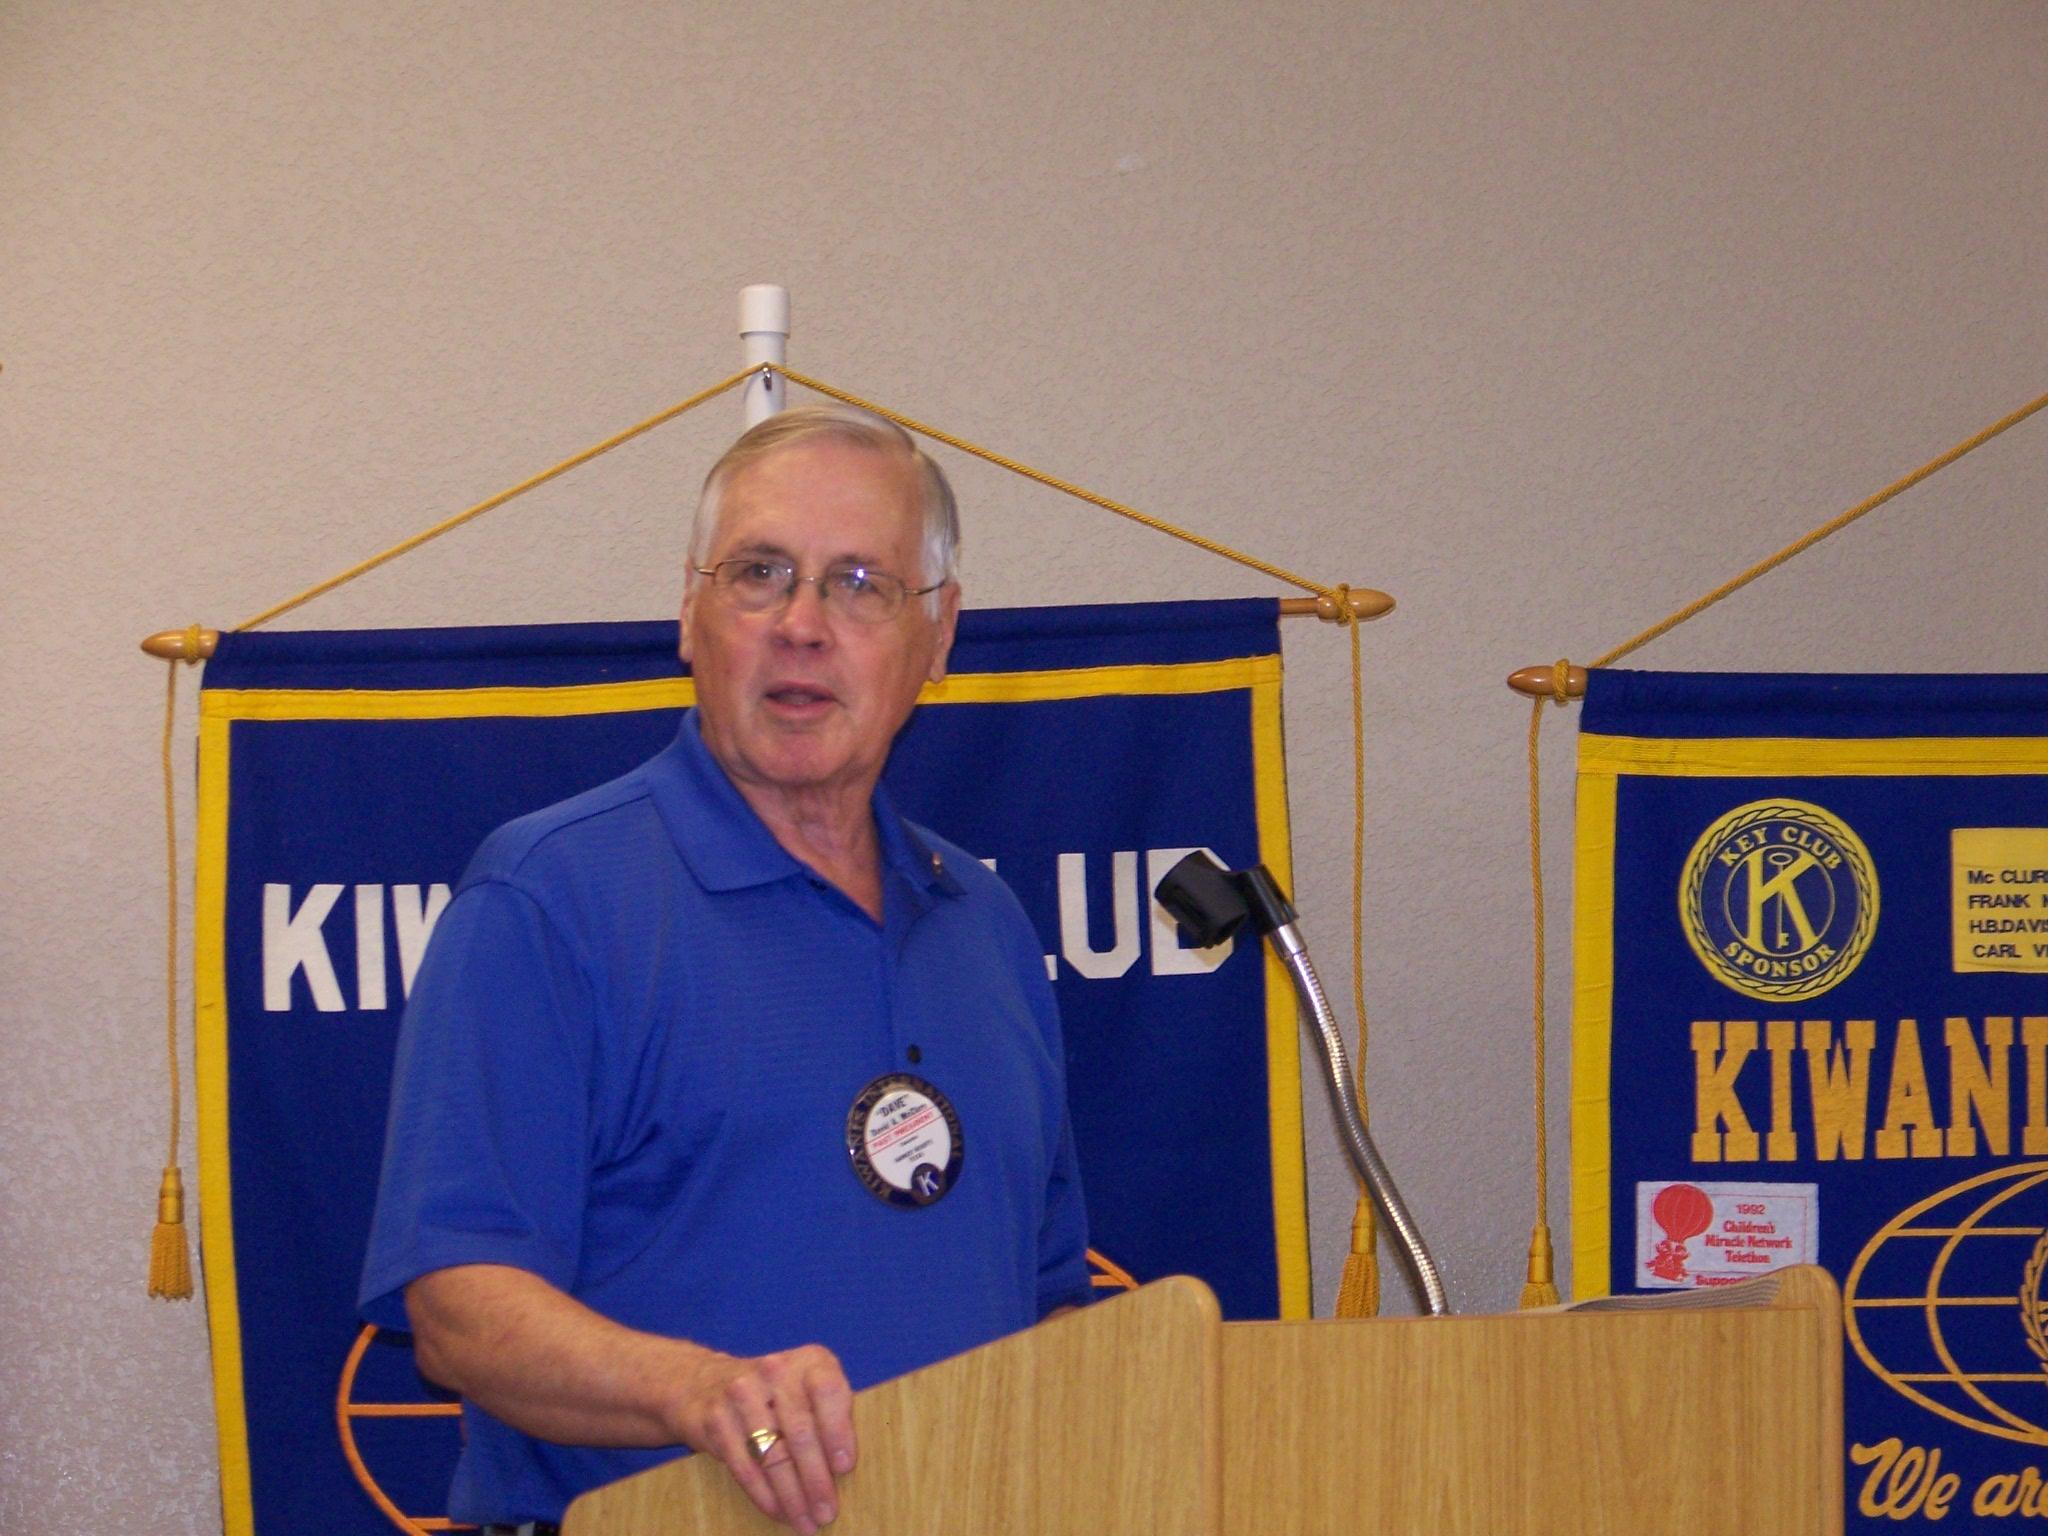 2016-17 Club President David McClure